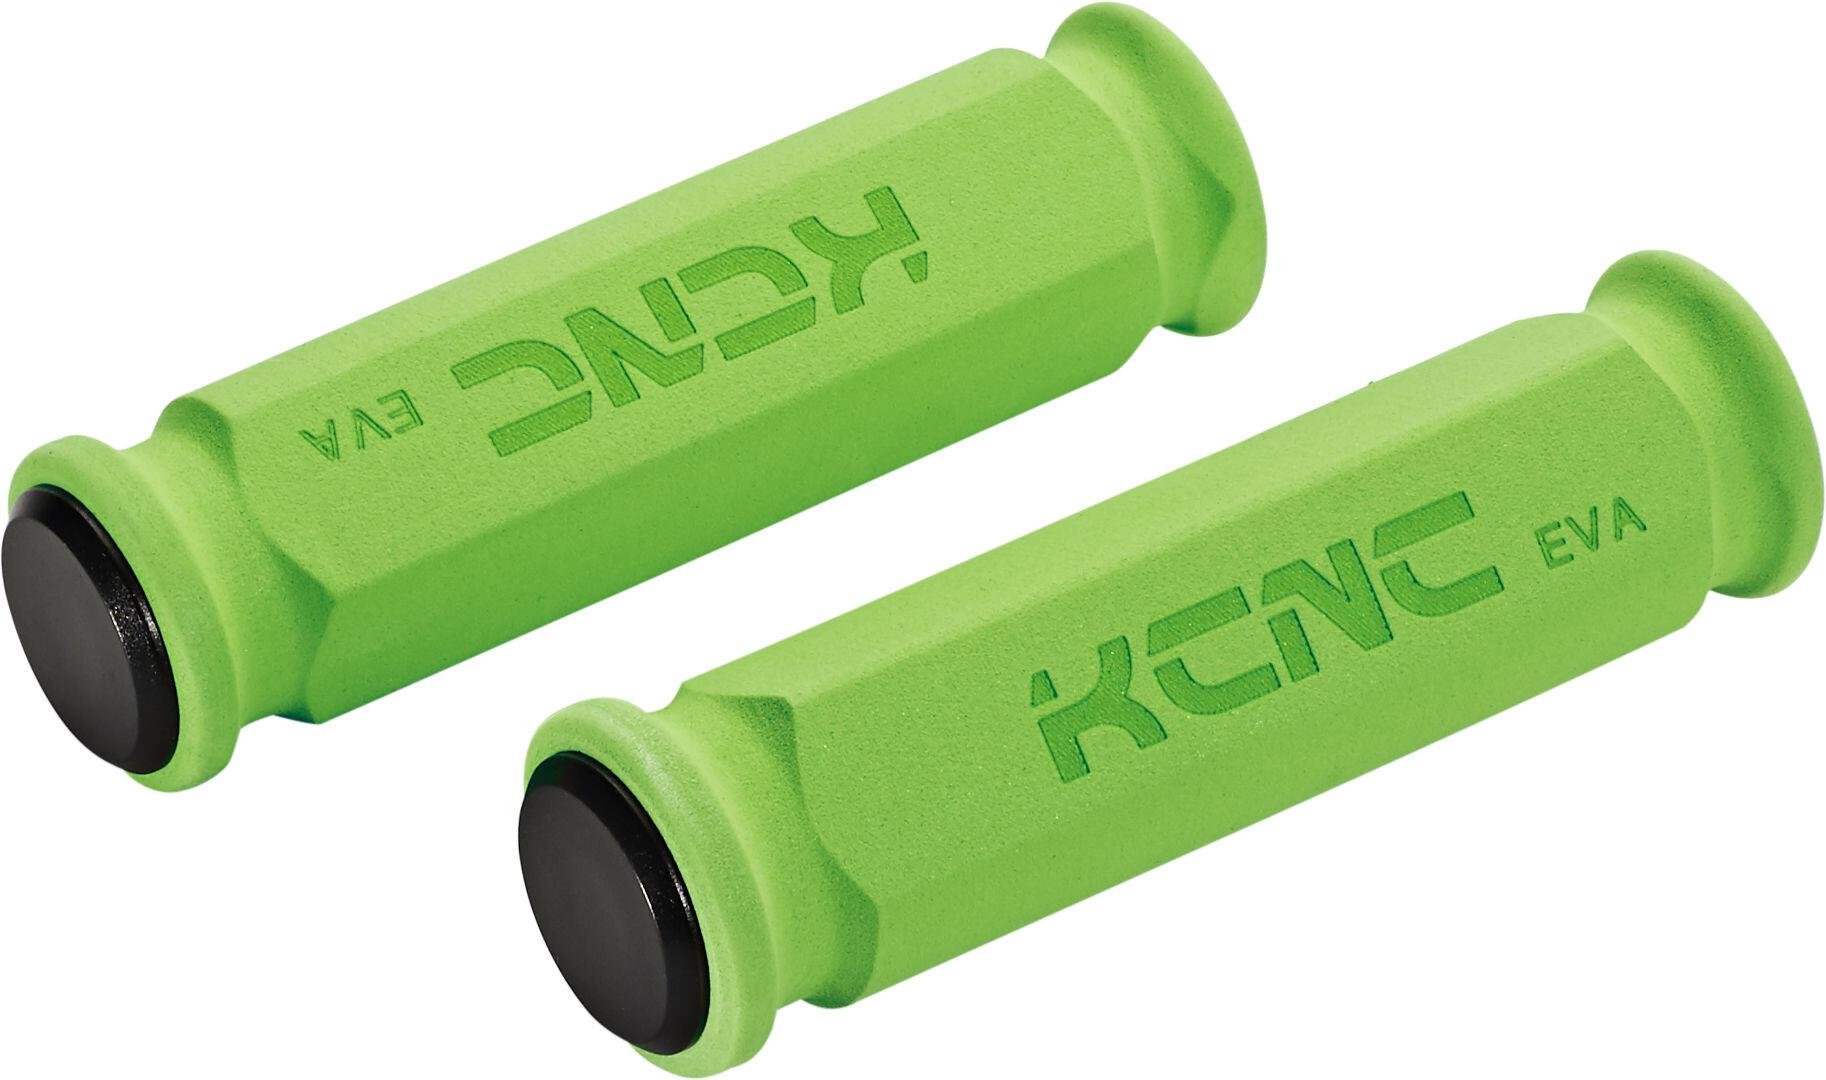 KCNC styrgreb, green | Handles